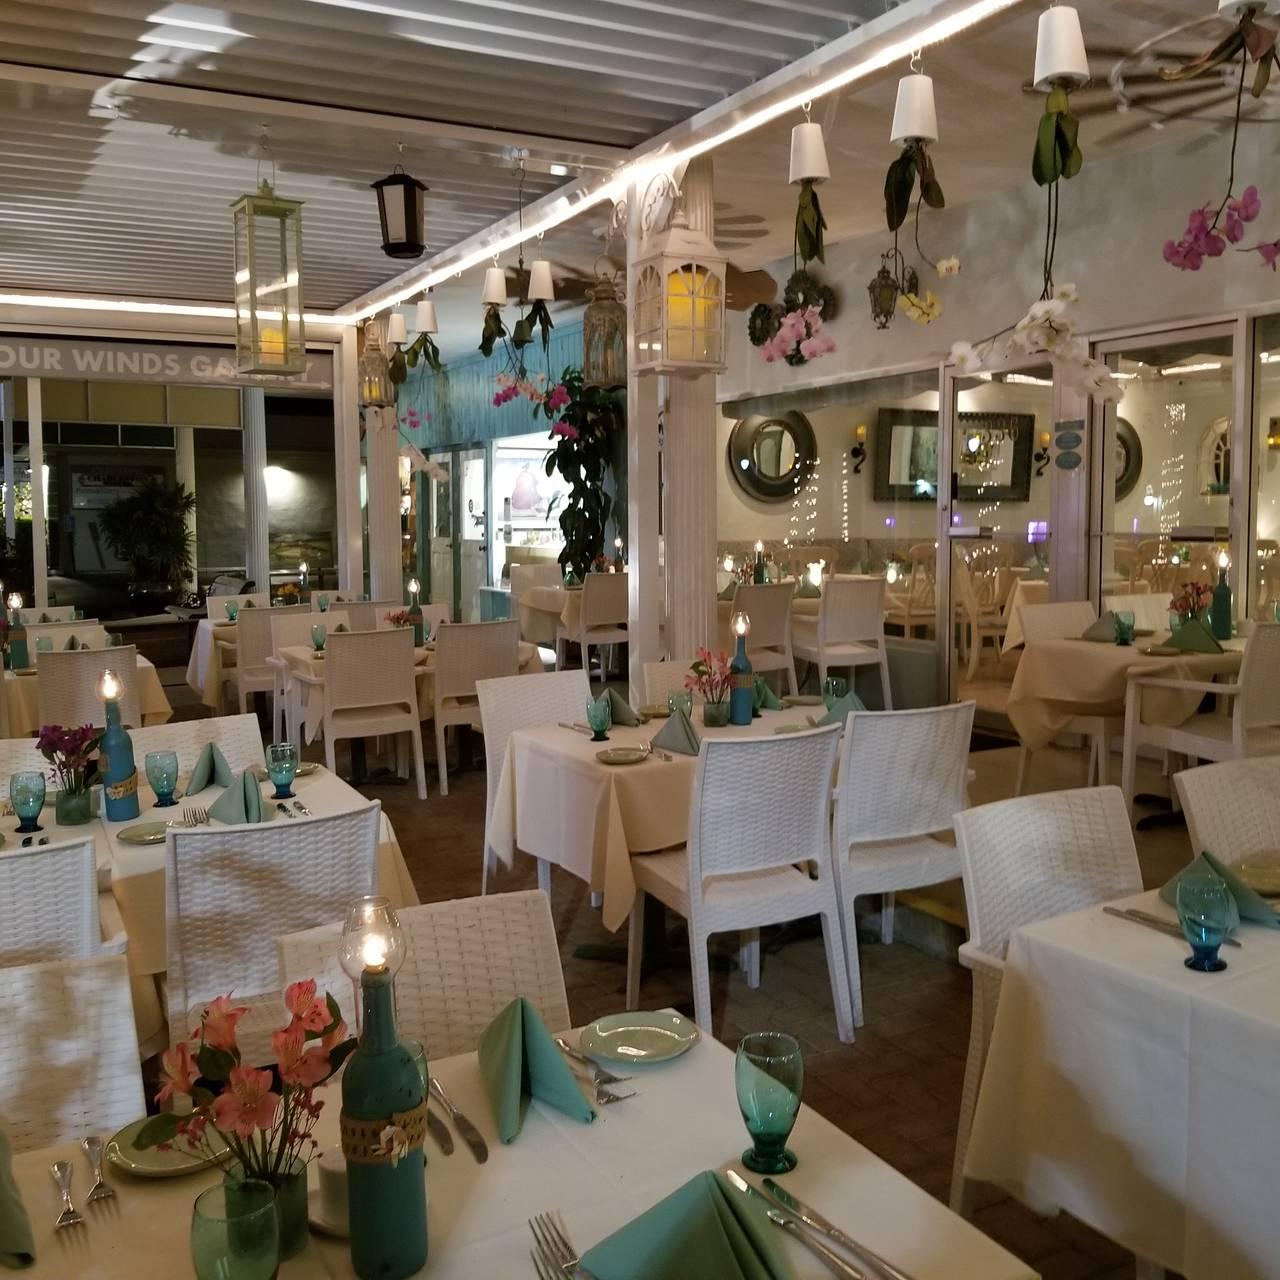 Mediterrano Restaurant - Naples, FL | OpenTable